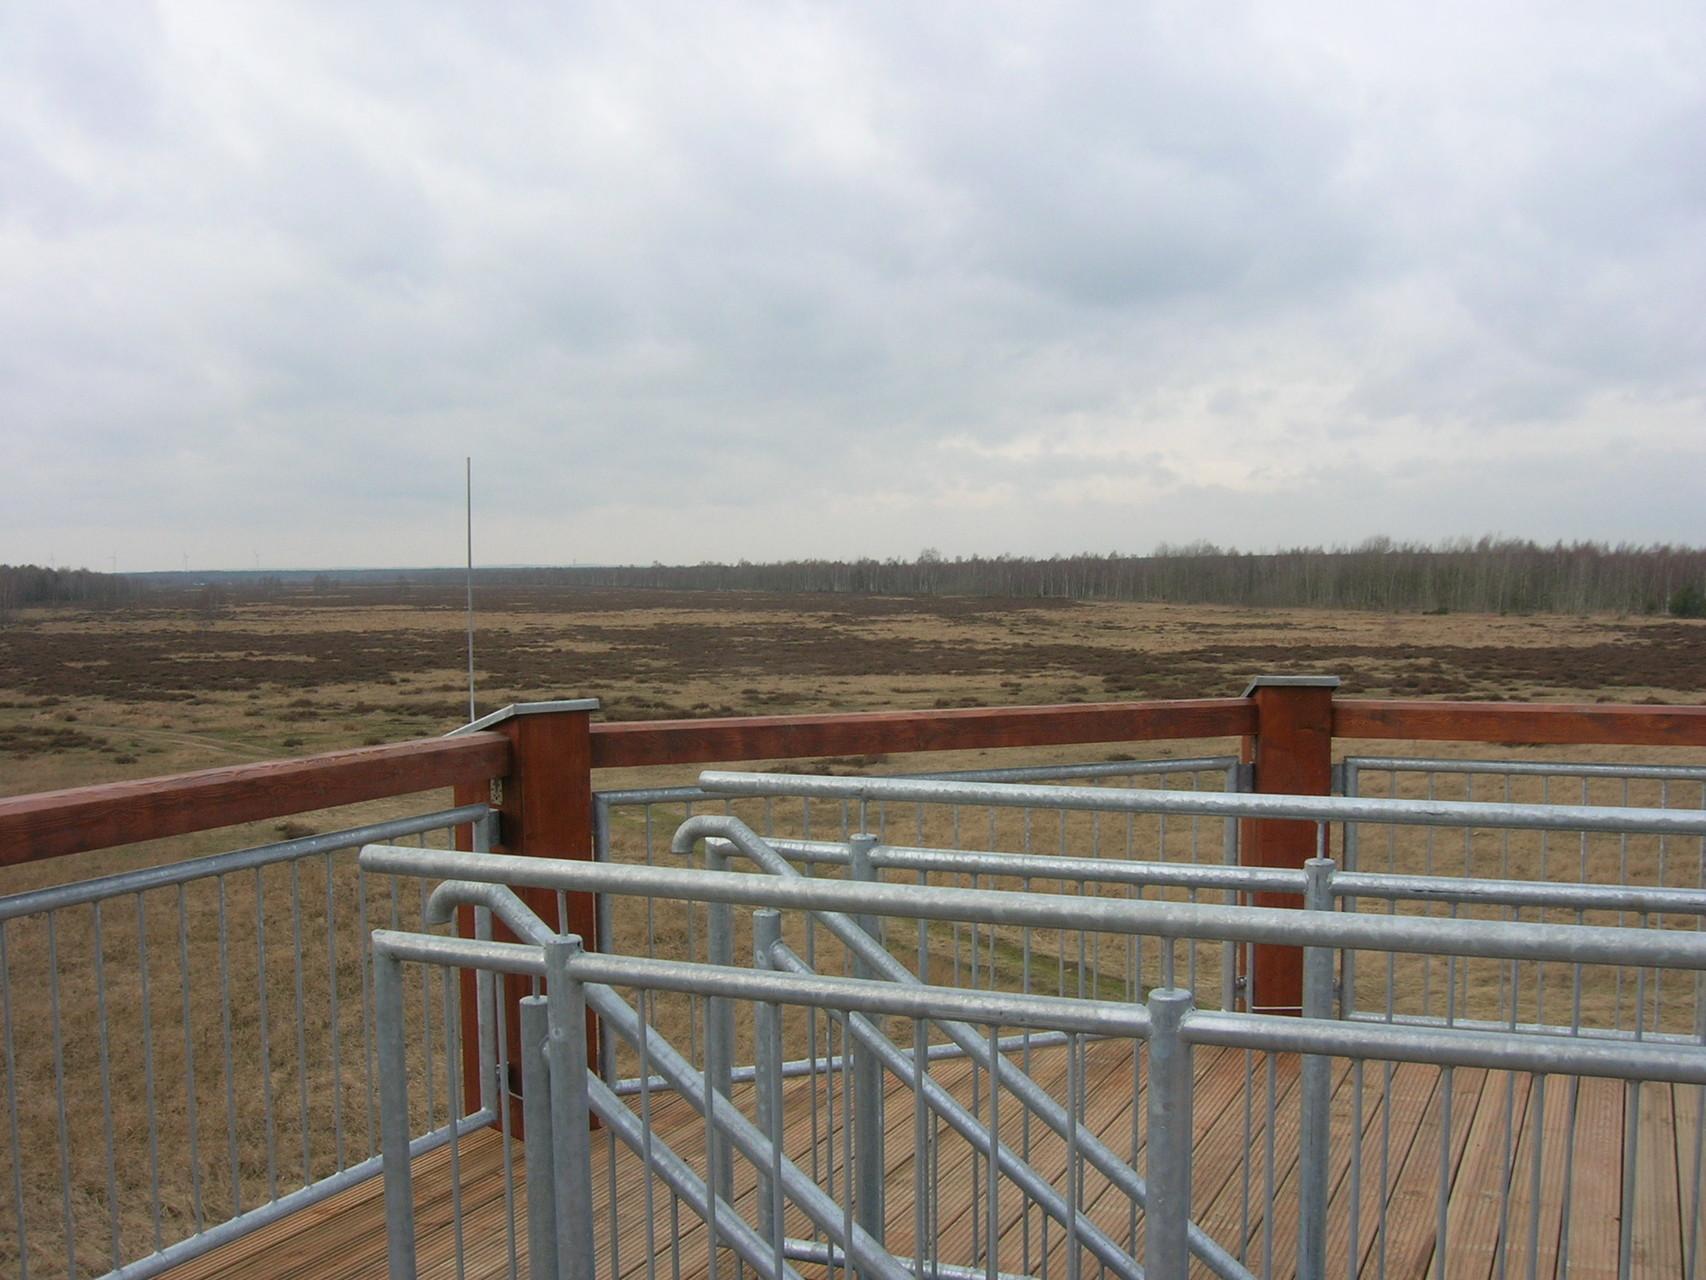 Aussichtsplattform, Naturschutzgebiet Gohrischheide bei Zeithain, 2014